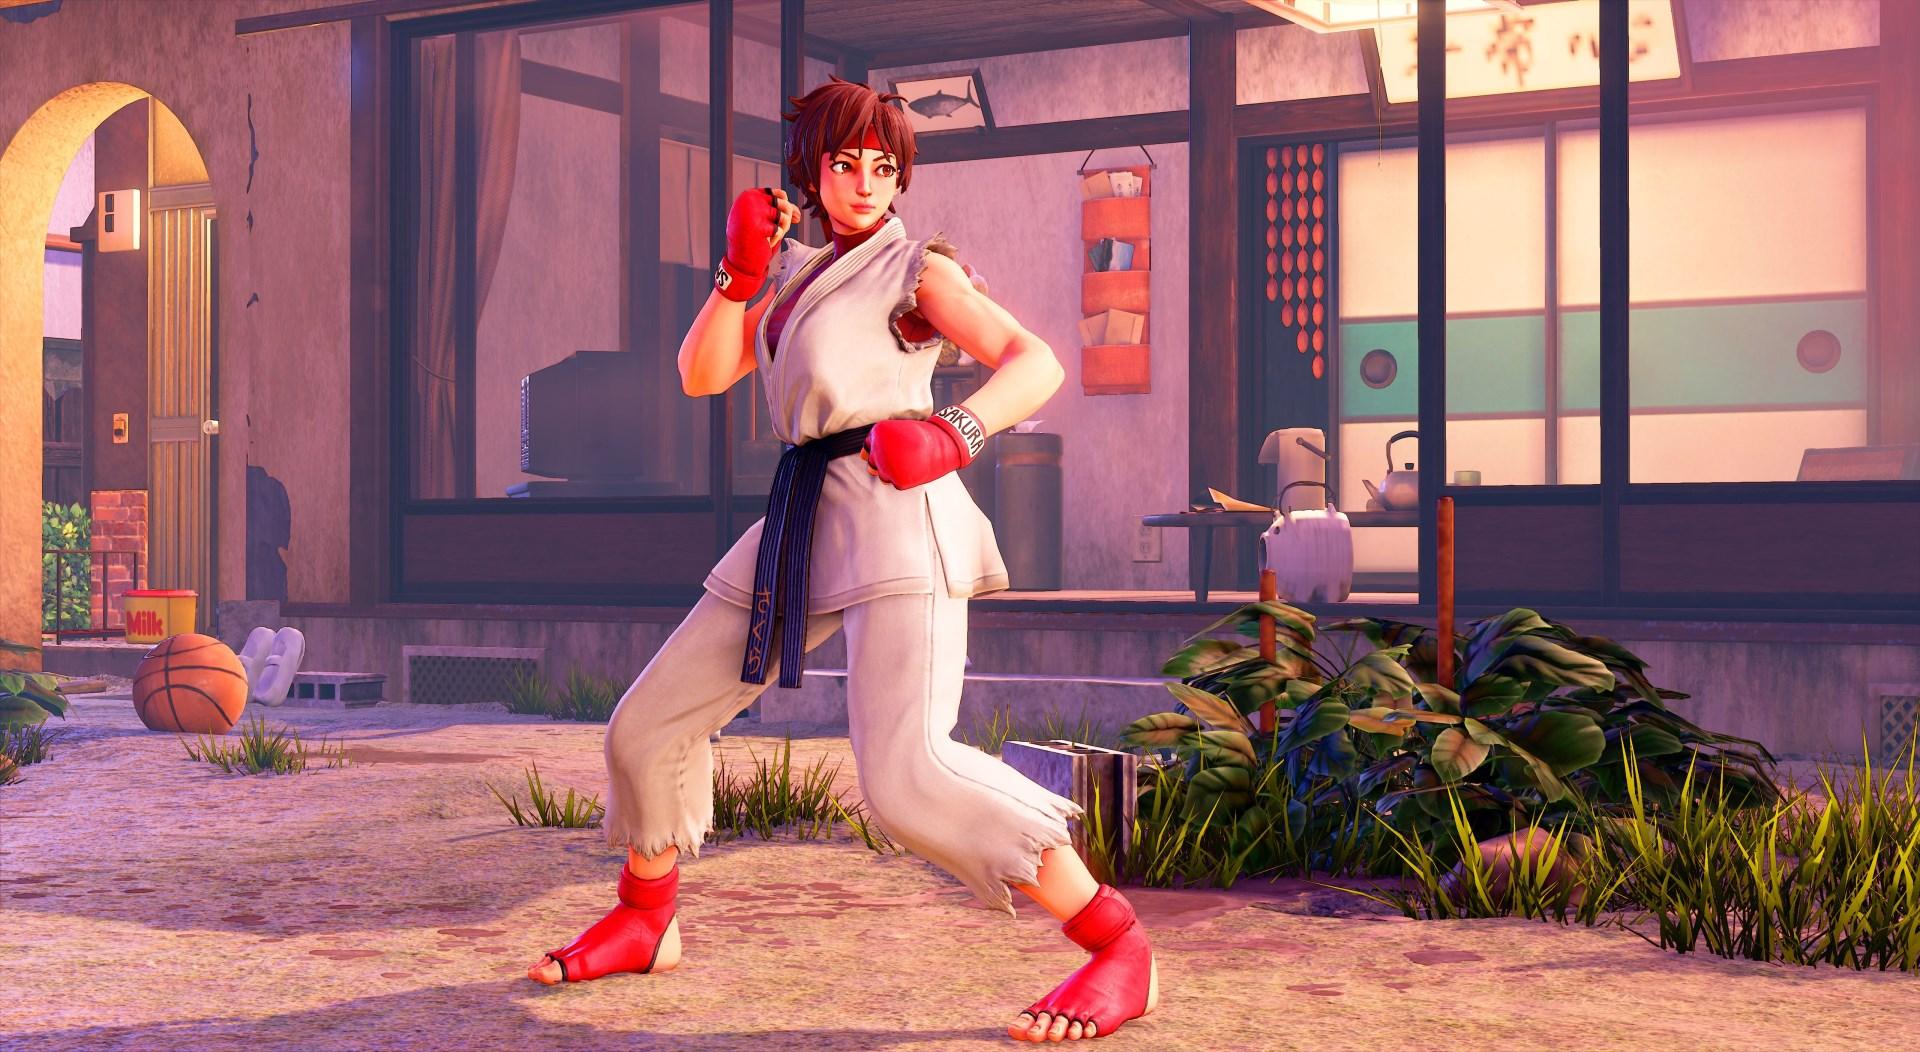 Street Fighter 5 - Sakura - Street Fighter 5